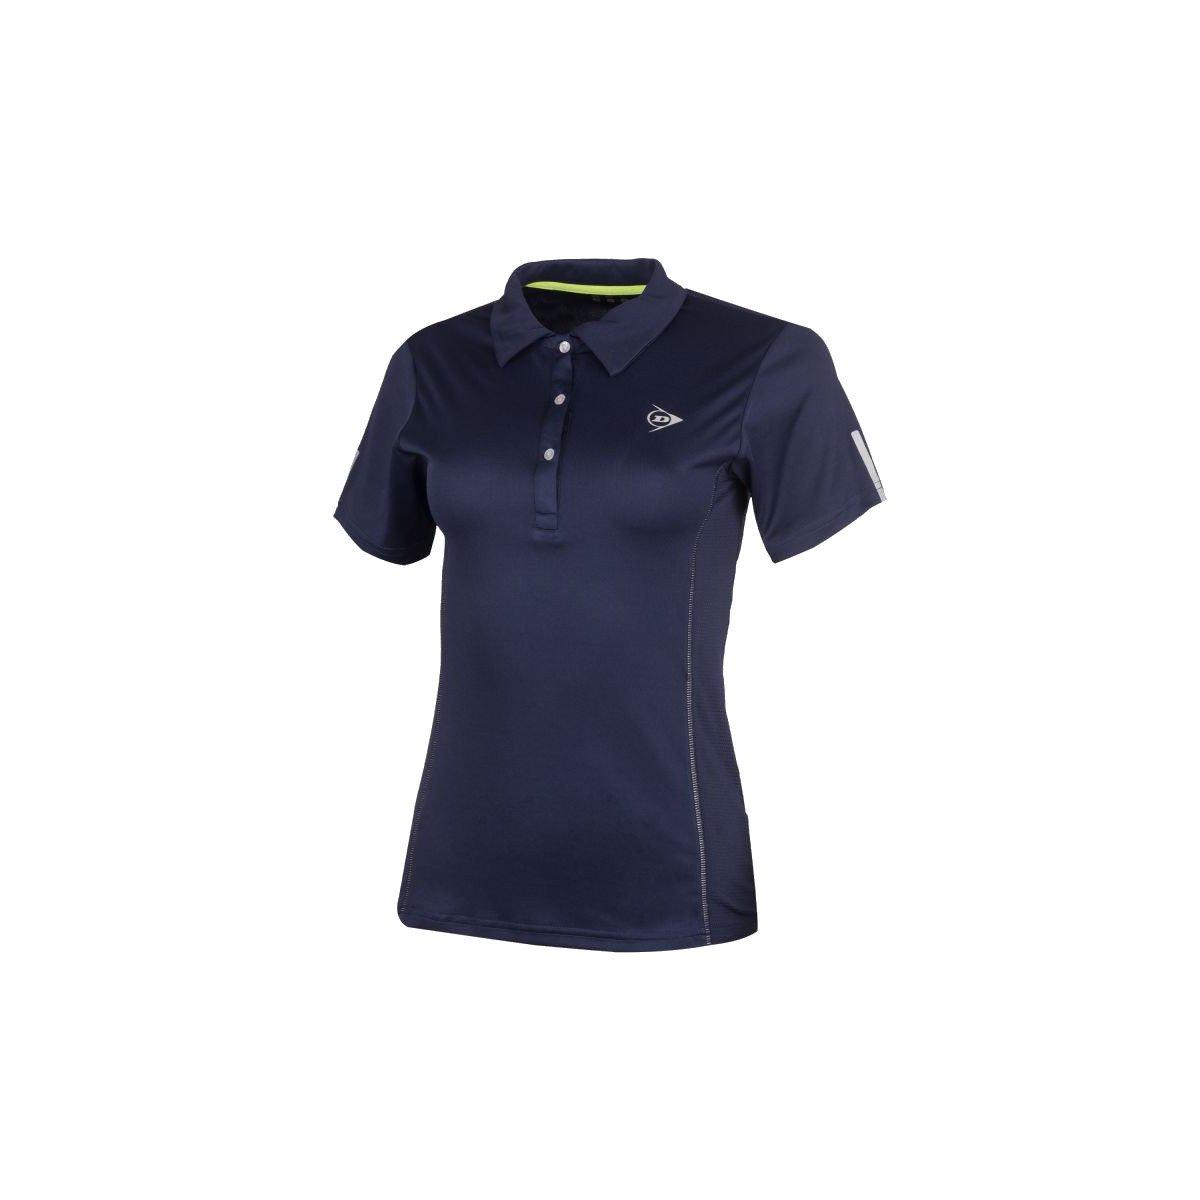 Dunlop Women's Club Collection Polo Tennis Shirt (Navy)